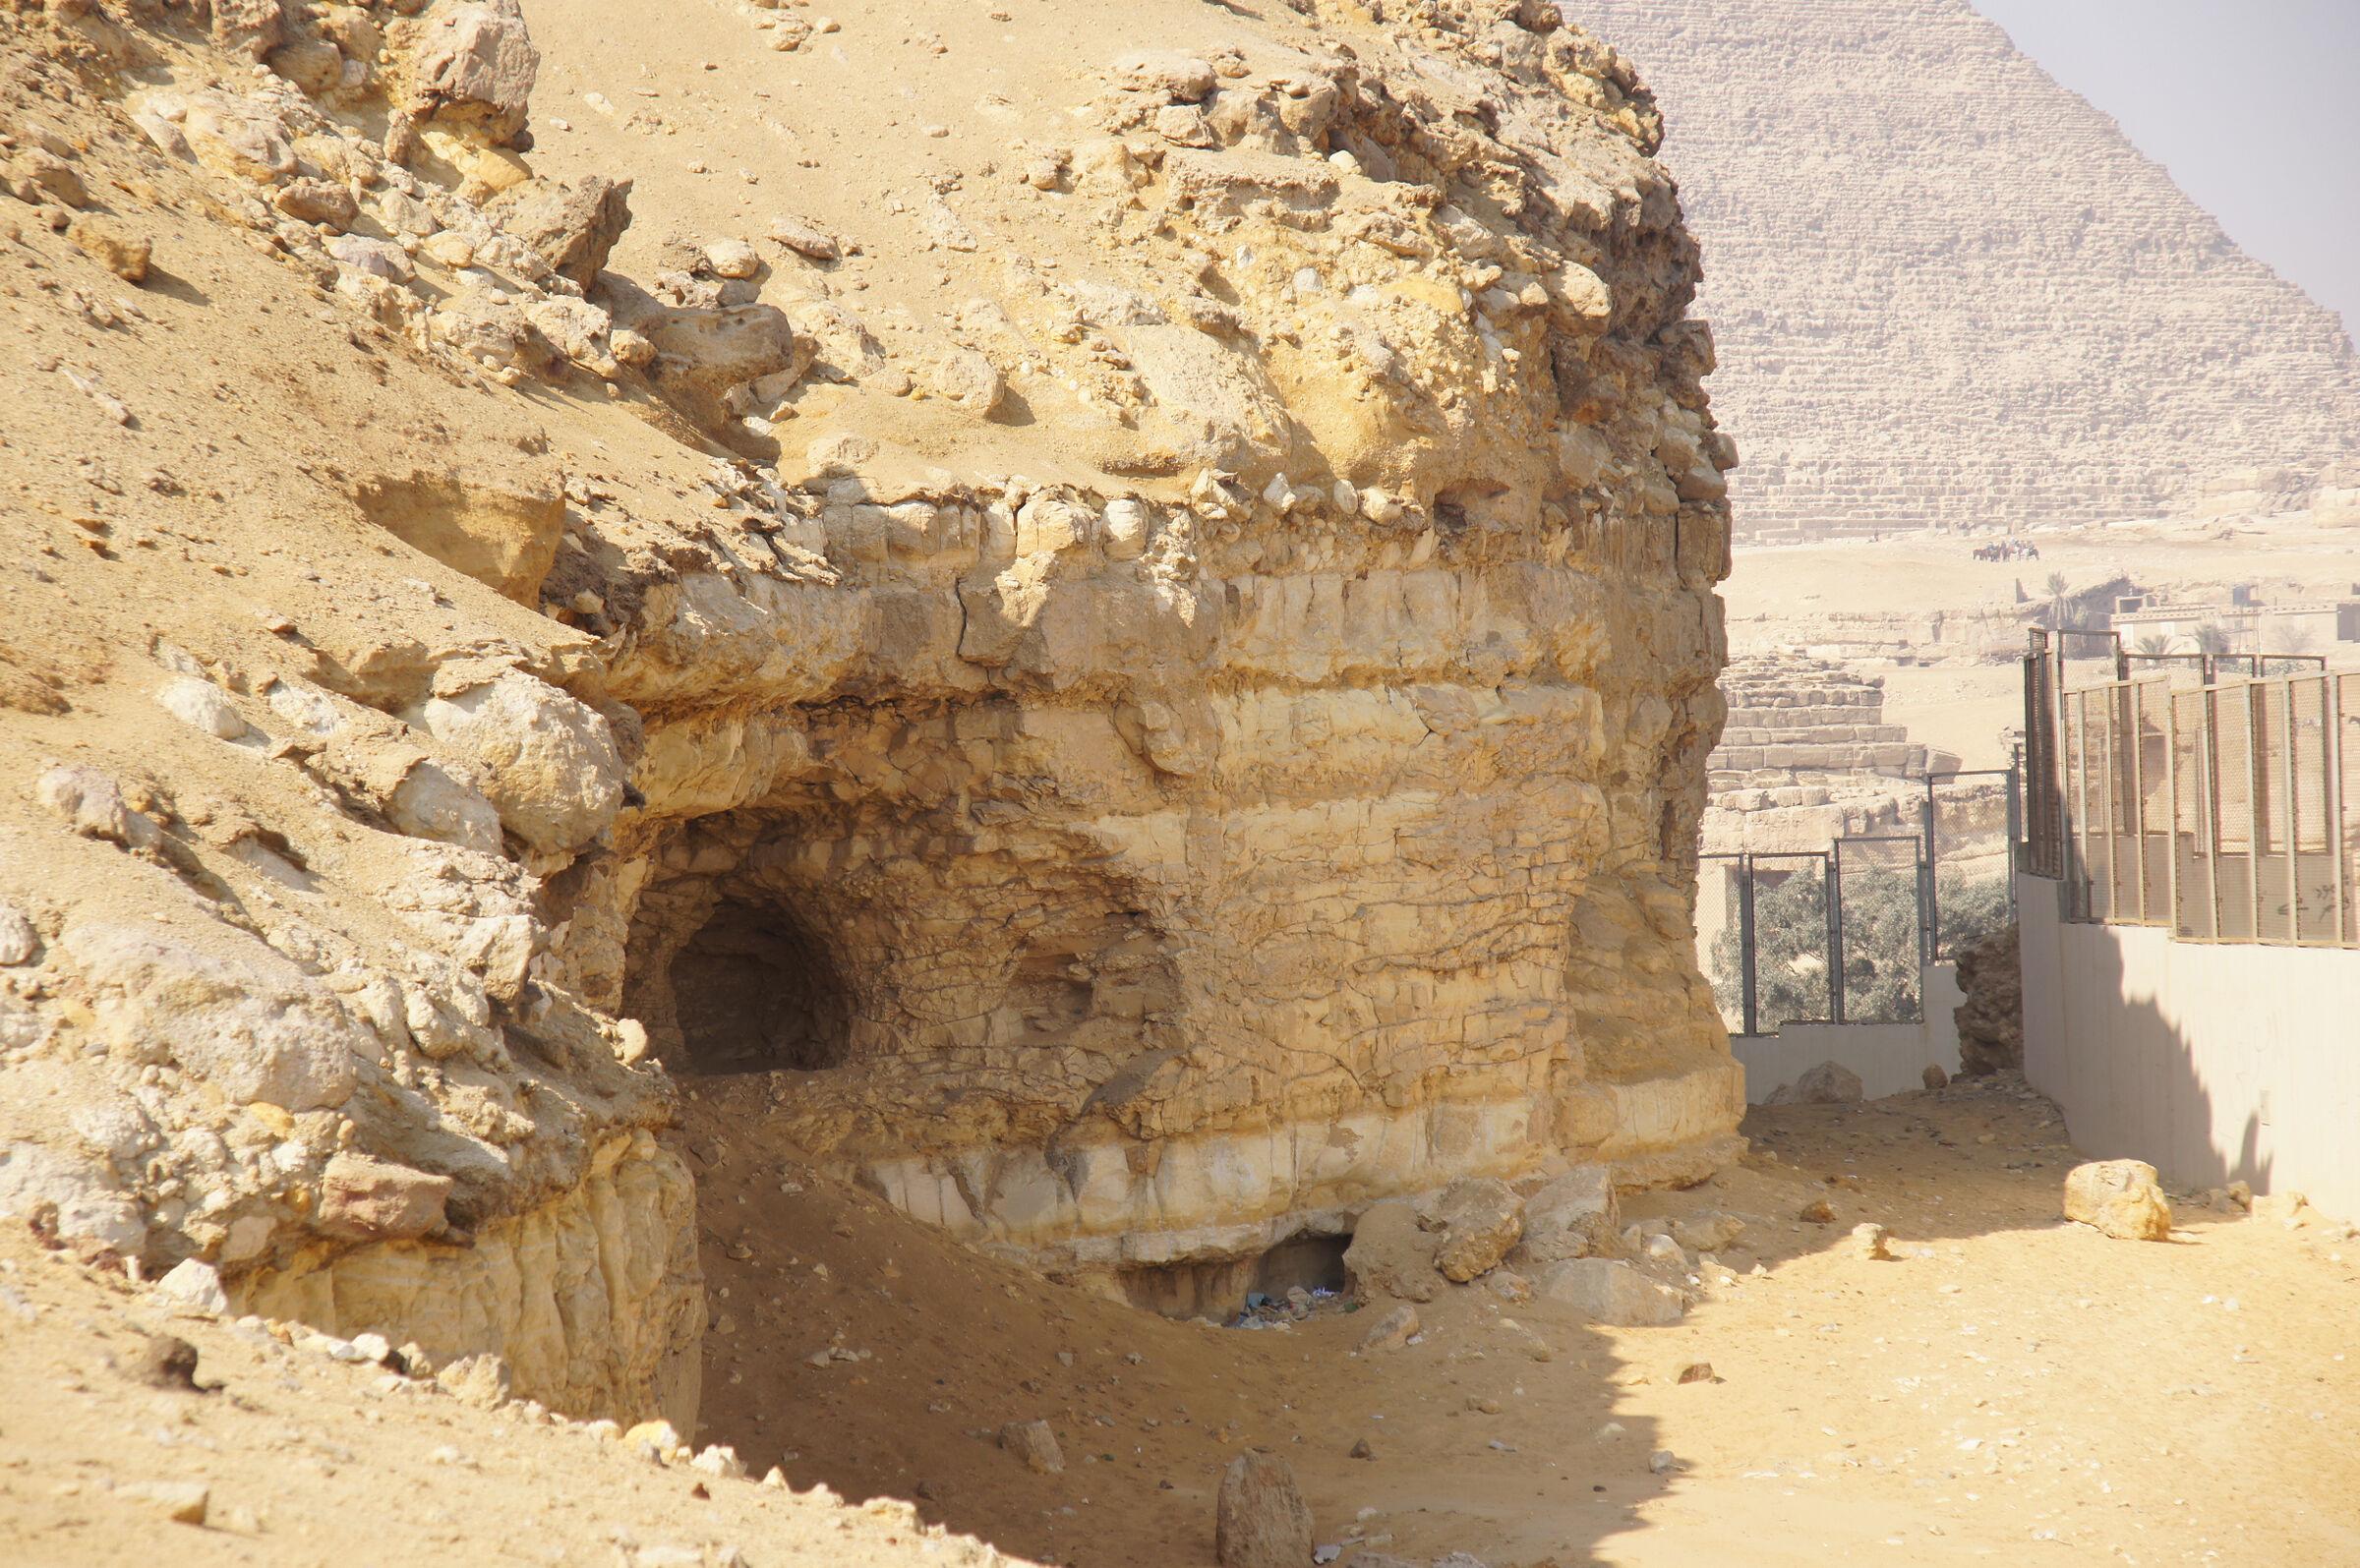 South Giza: Site: Giza; View: Southern Mount, Khafre Pyramid